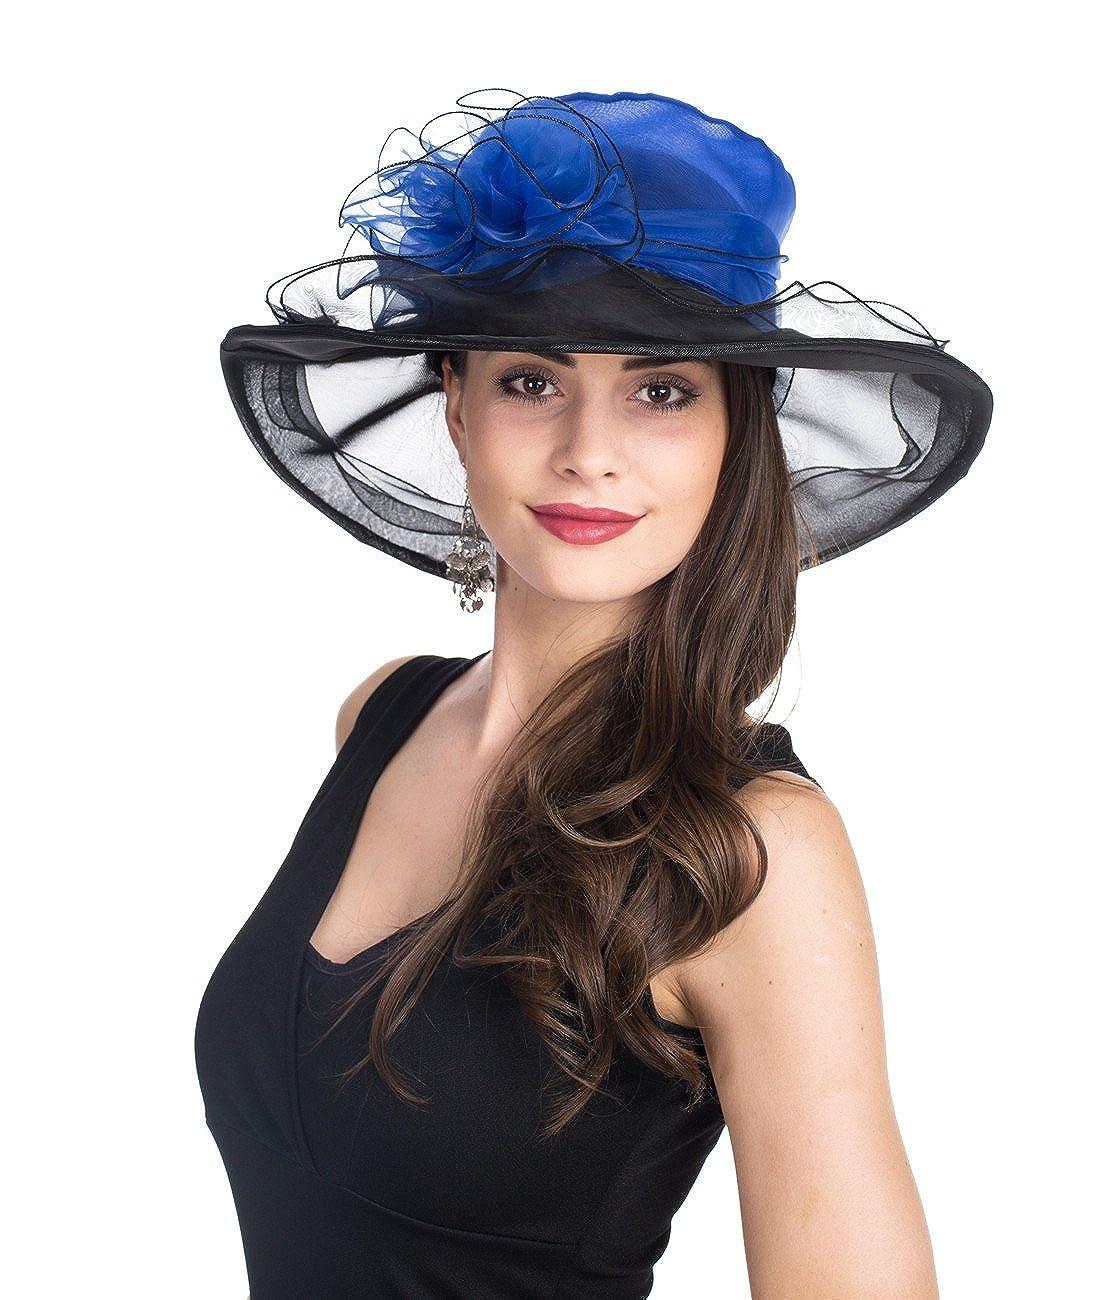 SAFERIN Womens Organza Church Kentucky Derby Hat Feather Veil Fascinator Bridal Tea Party Wedding Hat